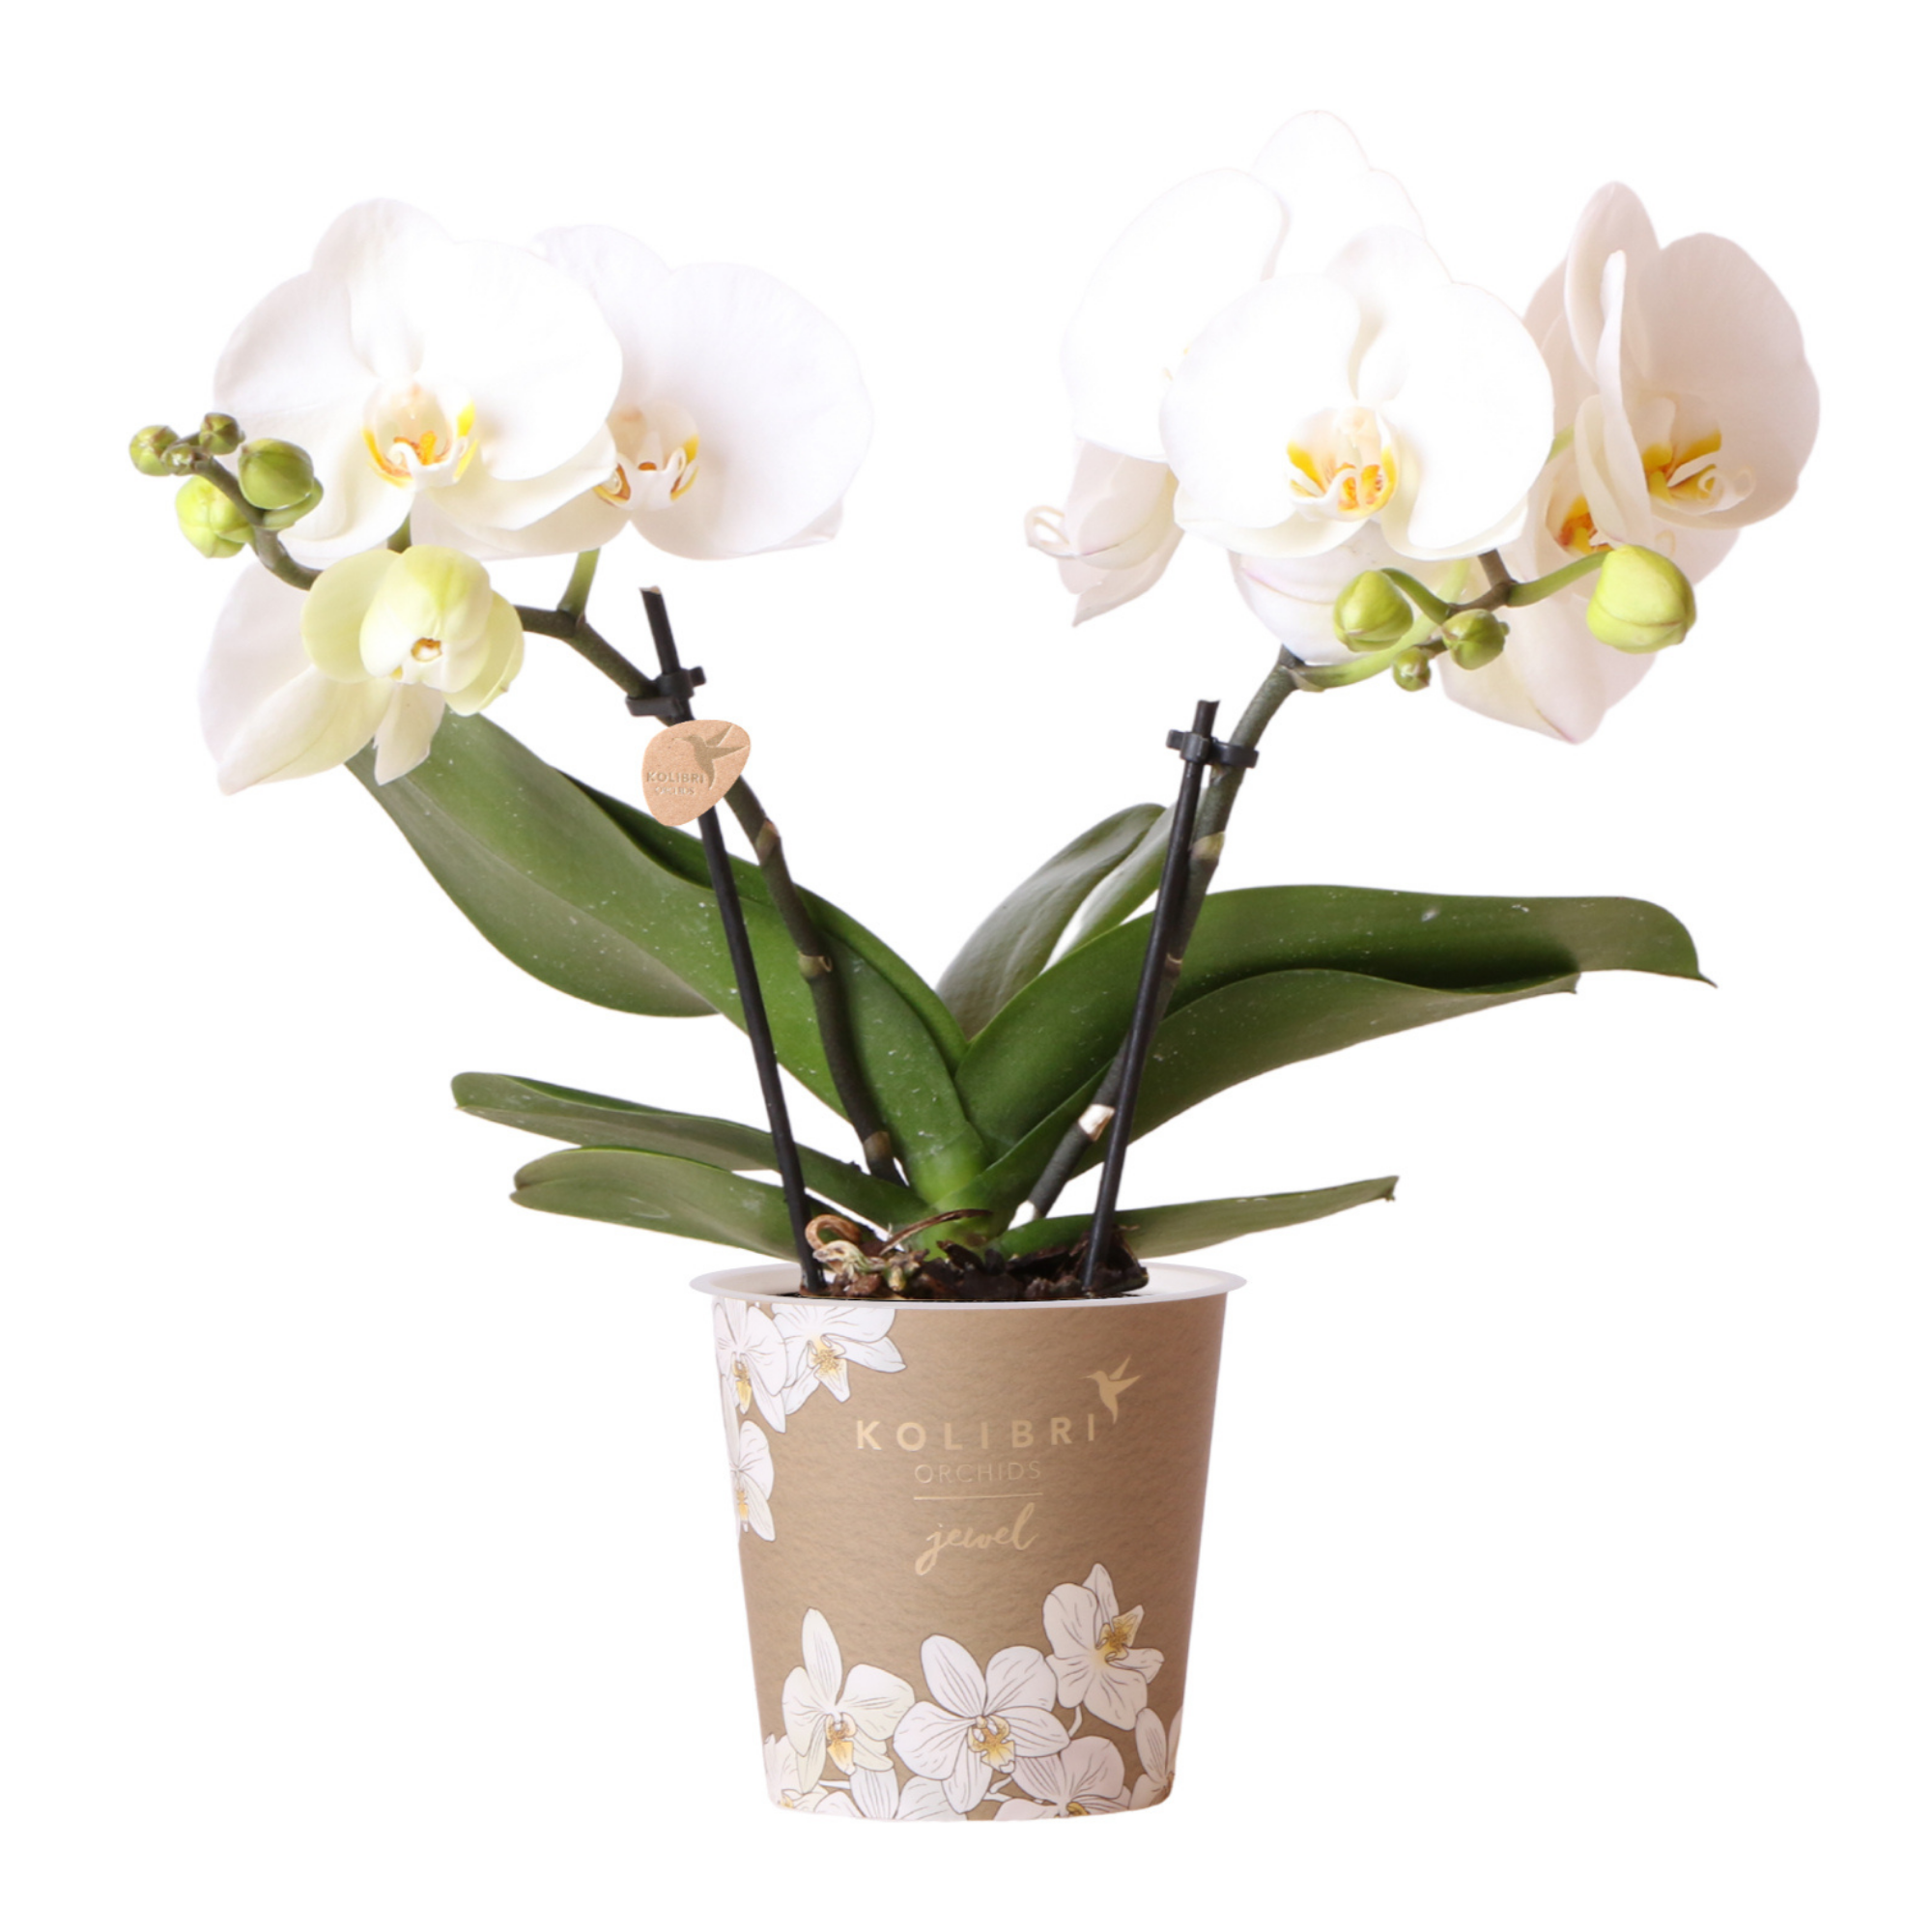 Kolibri Orchids Jewel Greenland 9cm